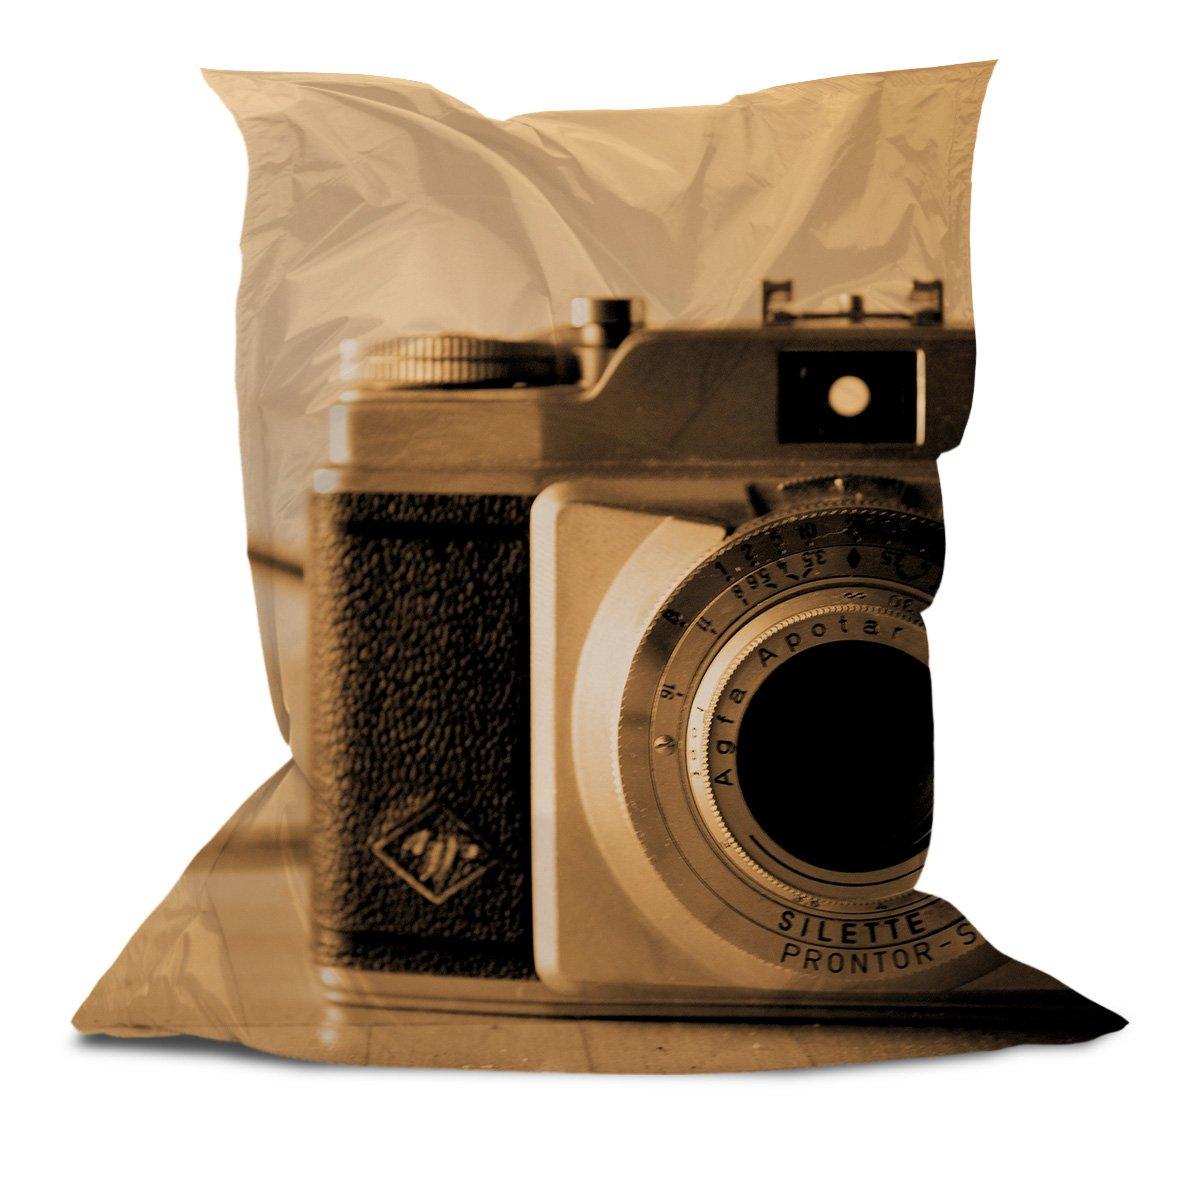 Branded Bean Bag with Printed Vintage Camera (5' x 4.4')